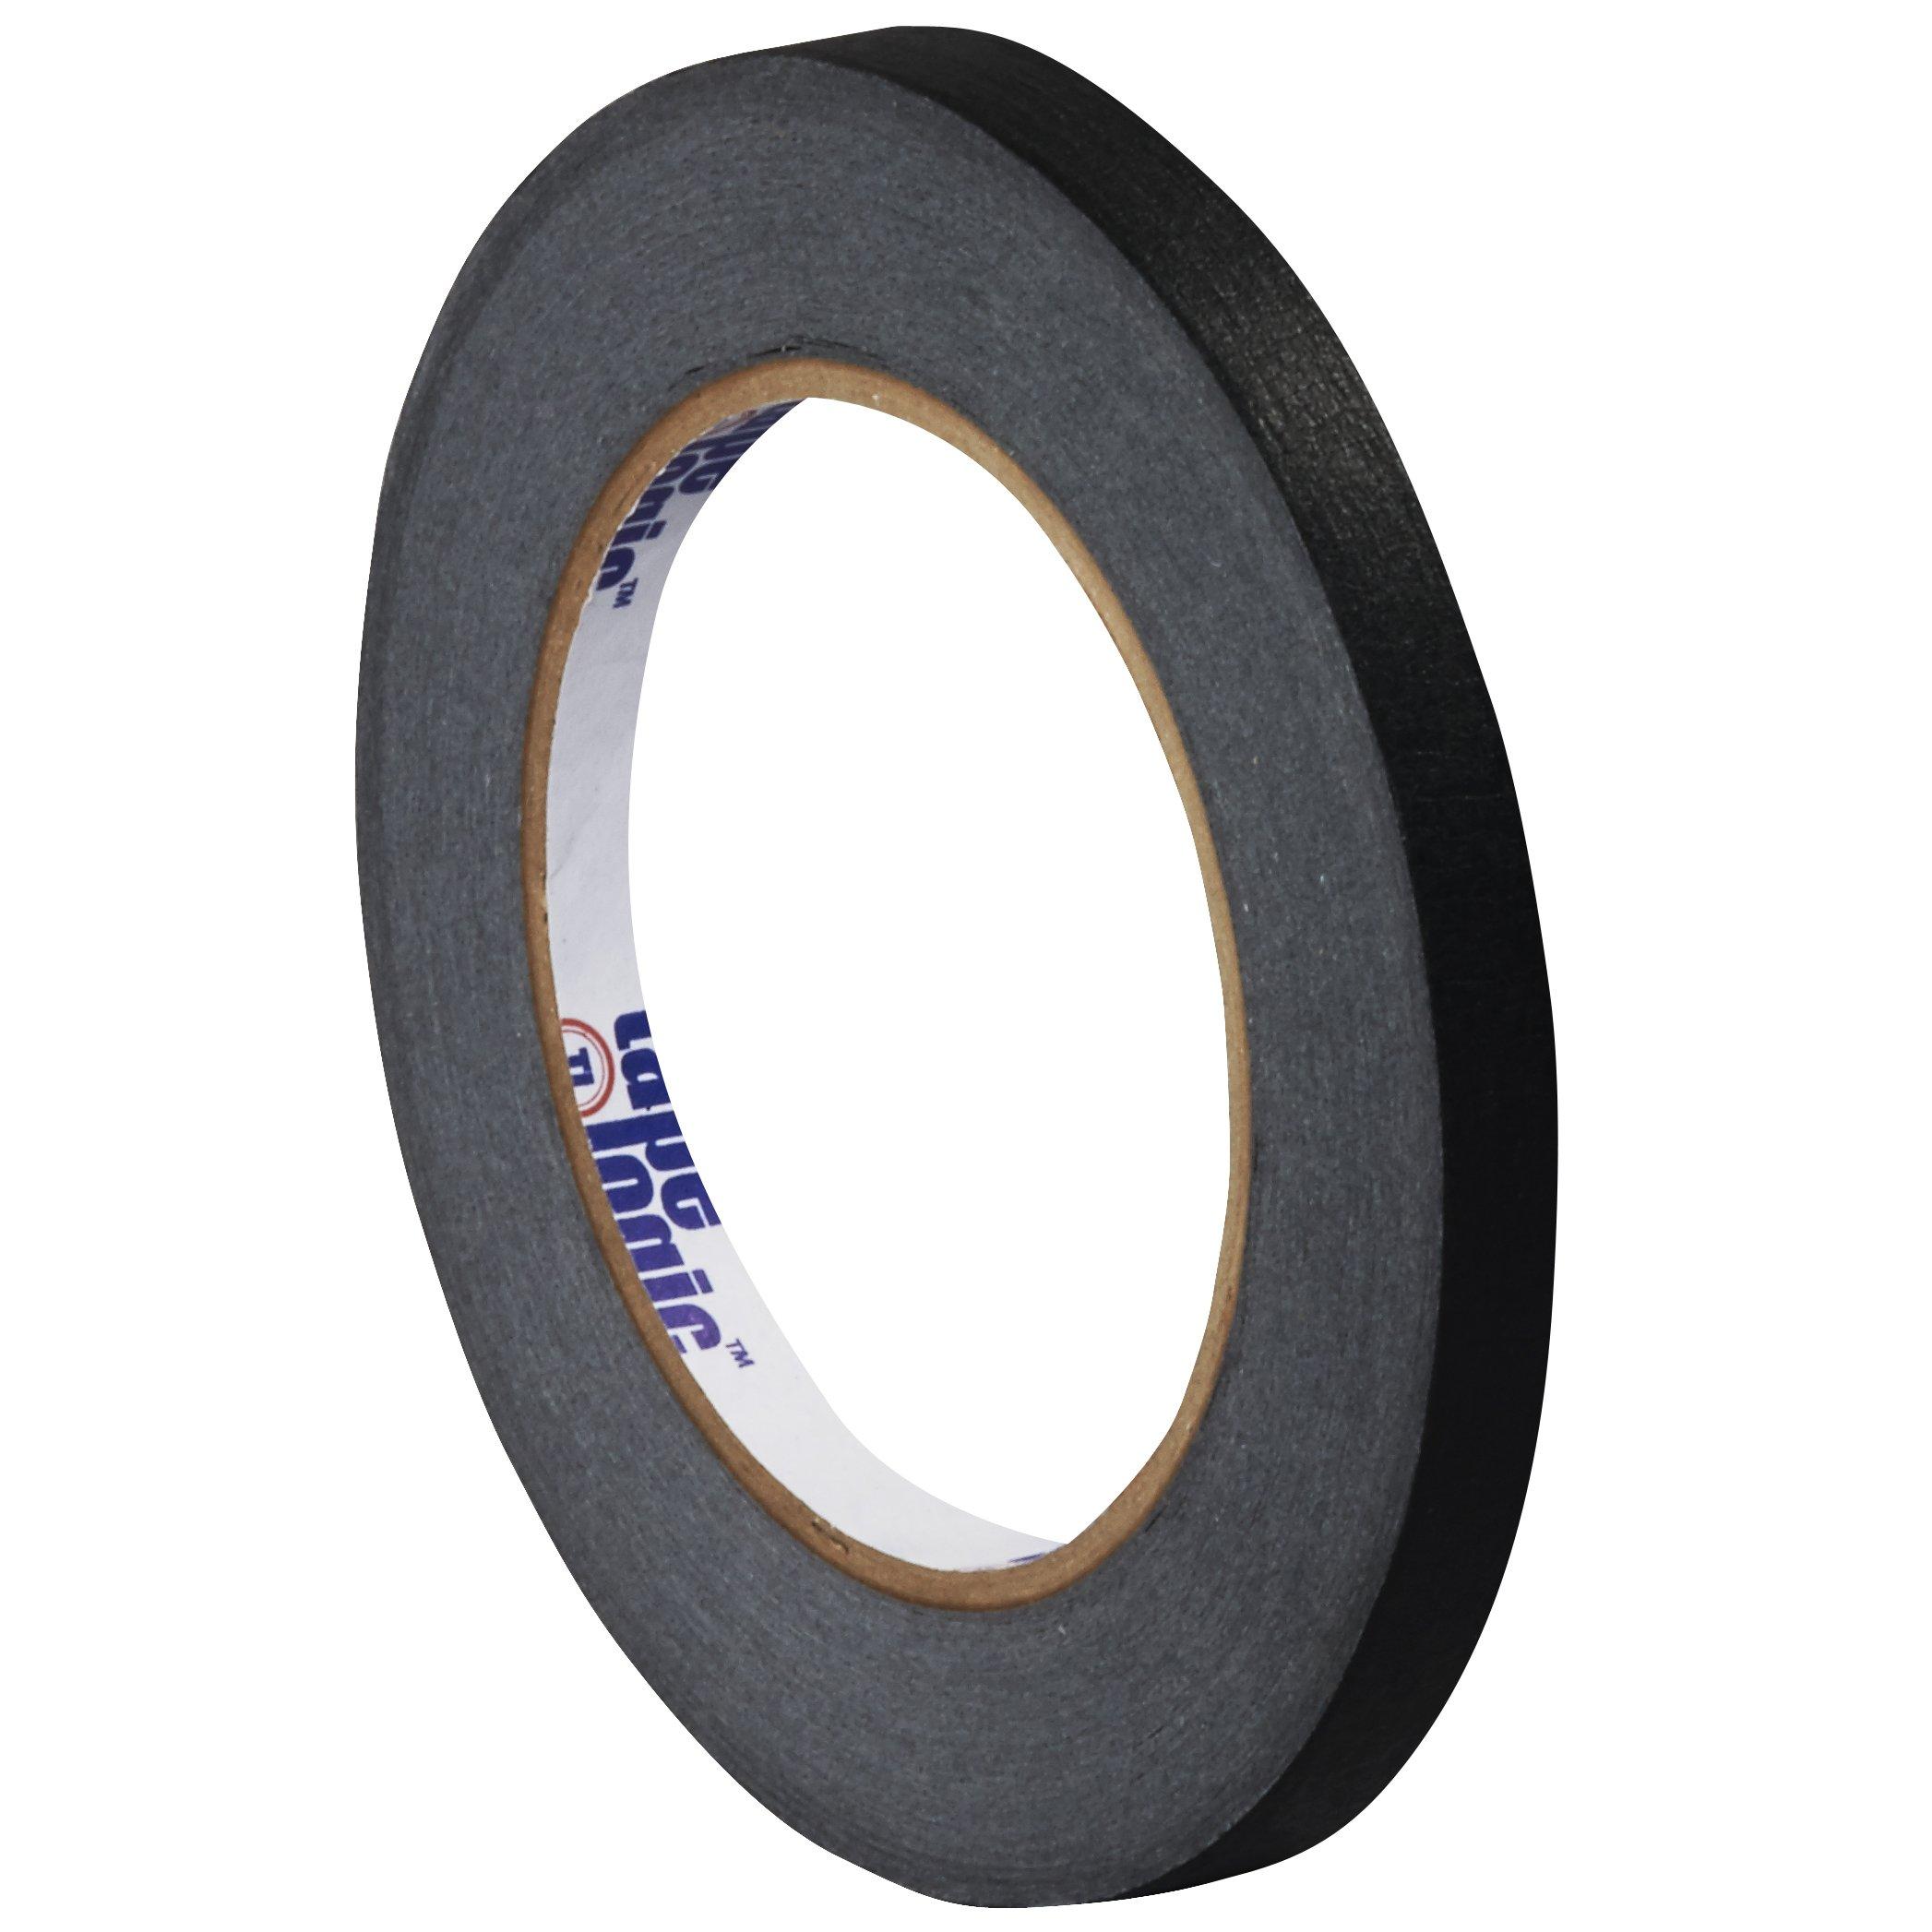 Tape Logic T93100312PKB Masking Tape, 60 yds Length x 1/4'' Width, Black (Case of 12)